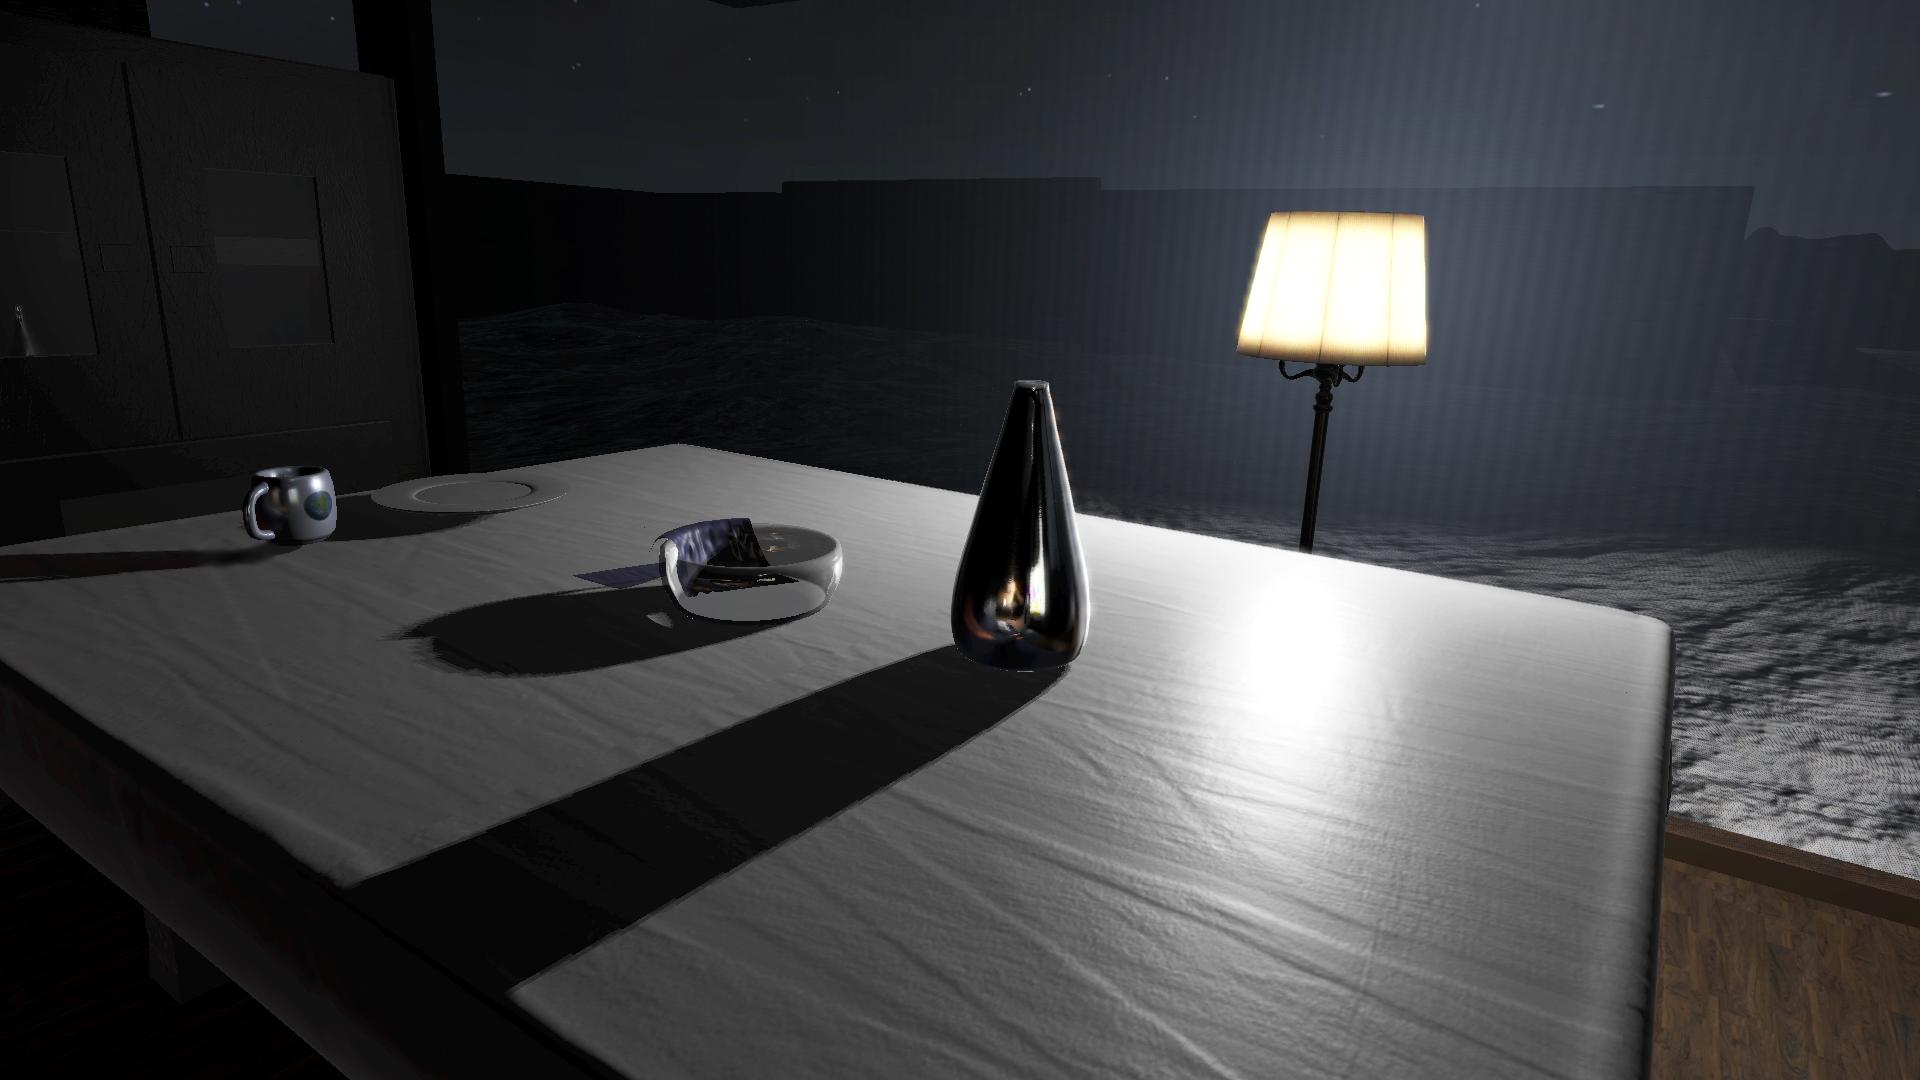 The Dreamer Screenshot.jpg